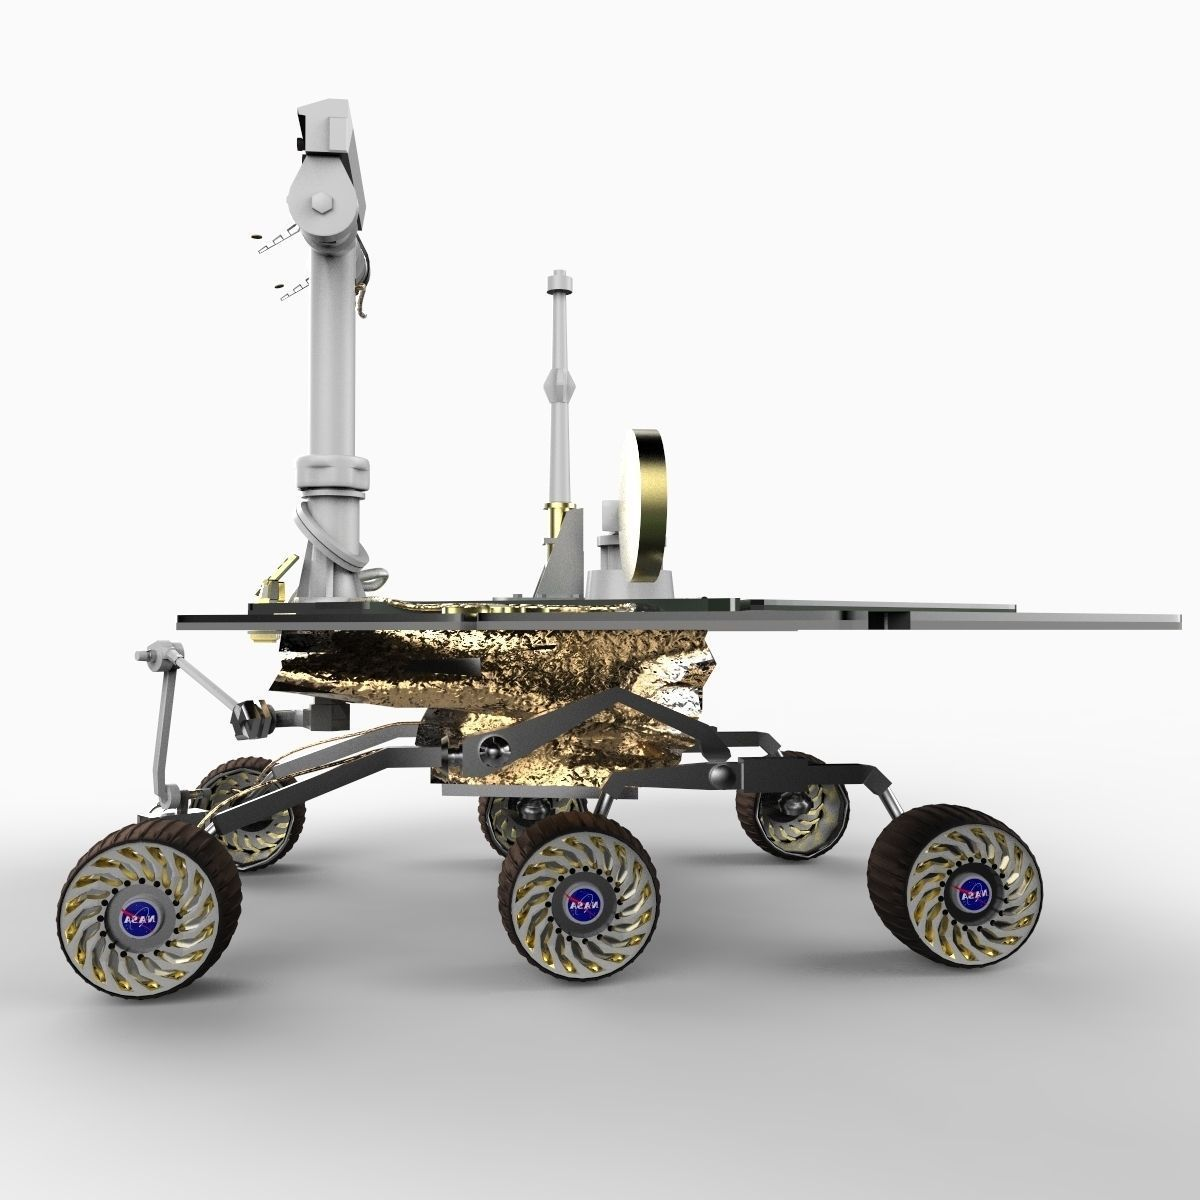 spirit rover model - photo #12